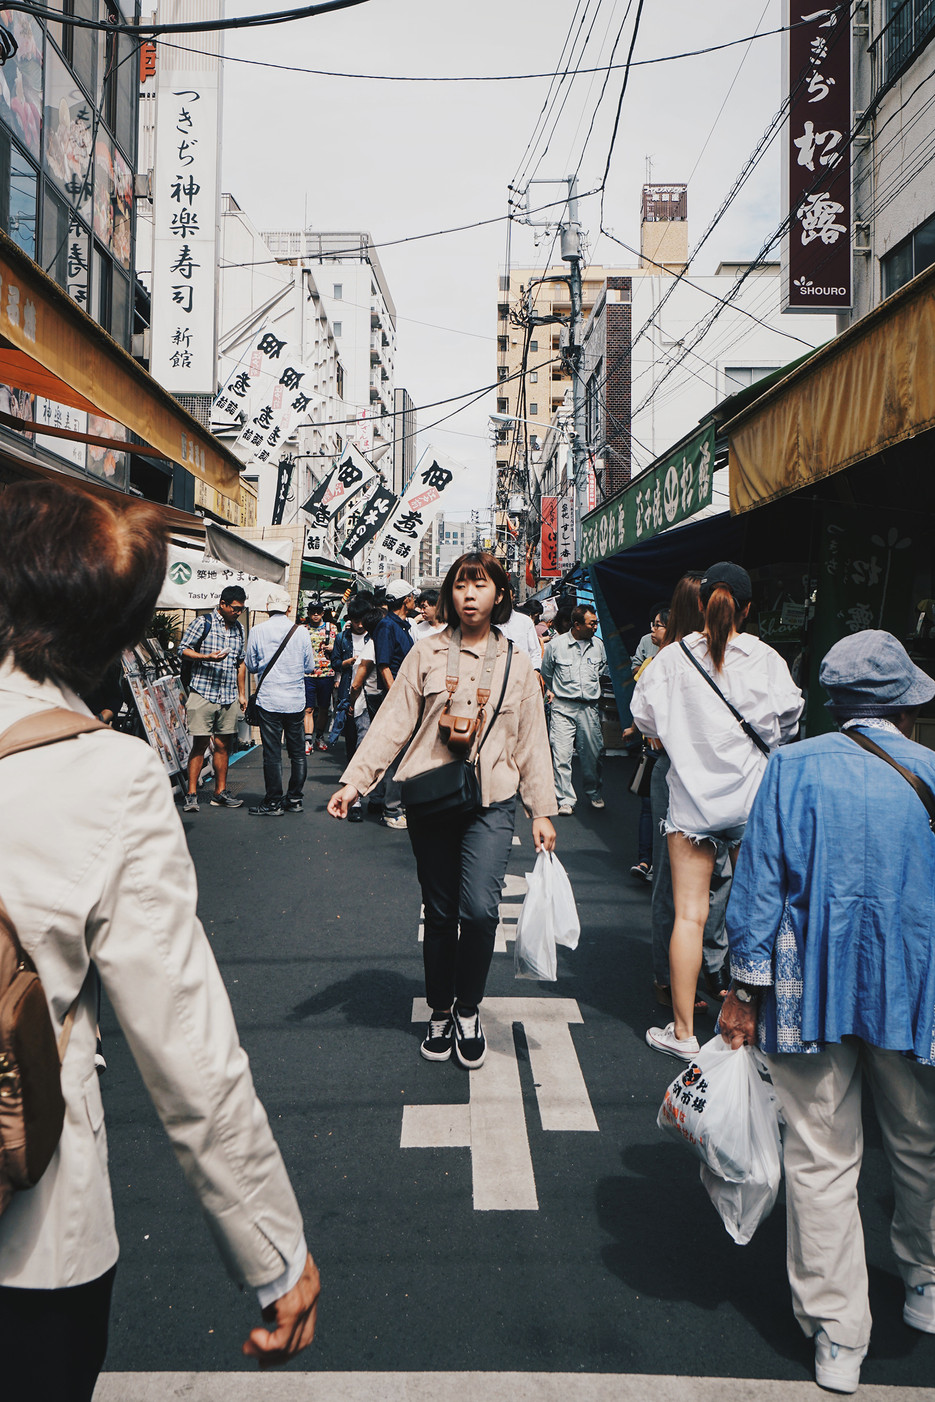 Street scene // Tsukiji Fish Market